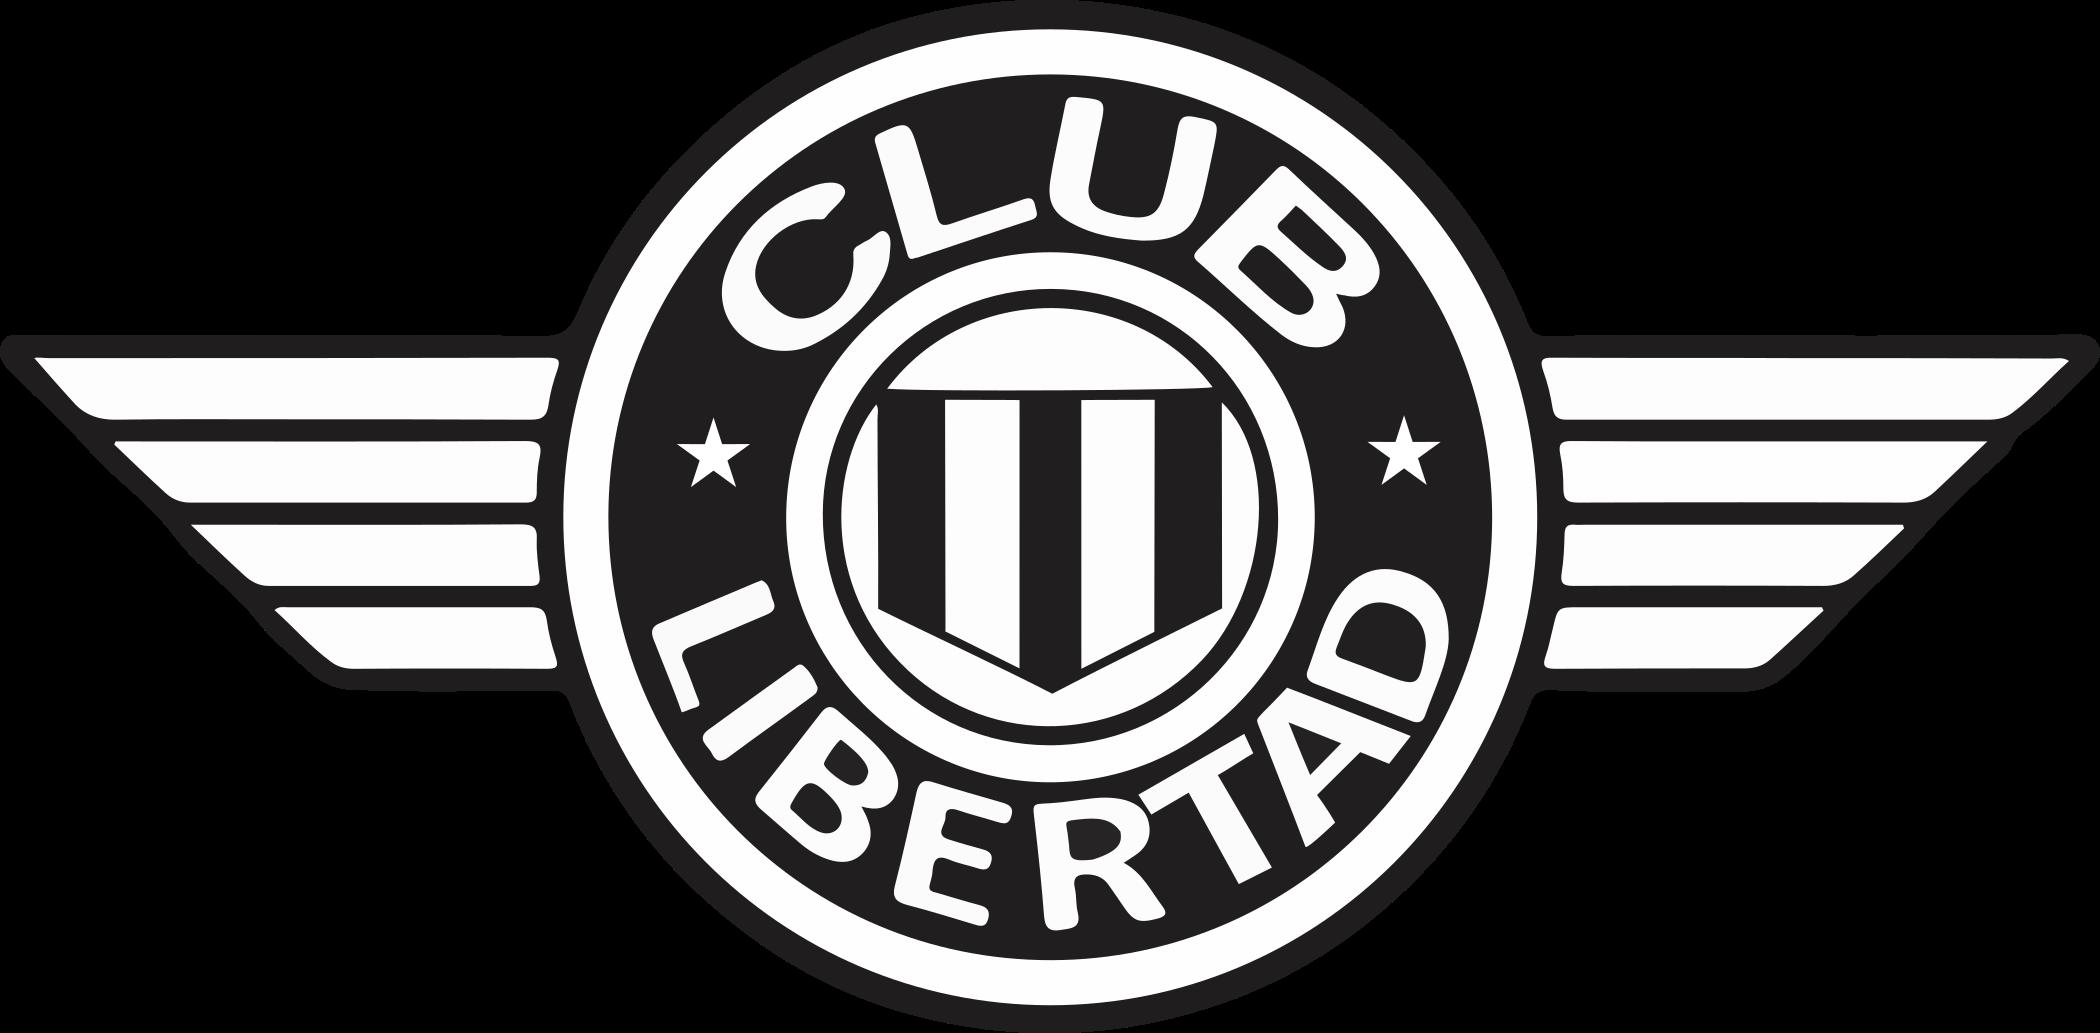 club libertad logo escudo 1 - Club Libertad Logo